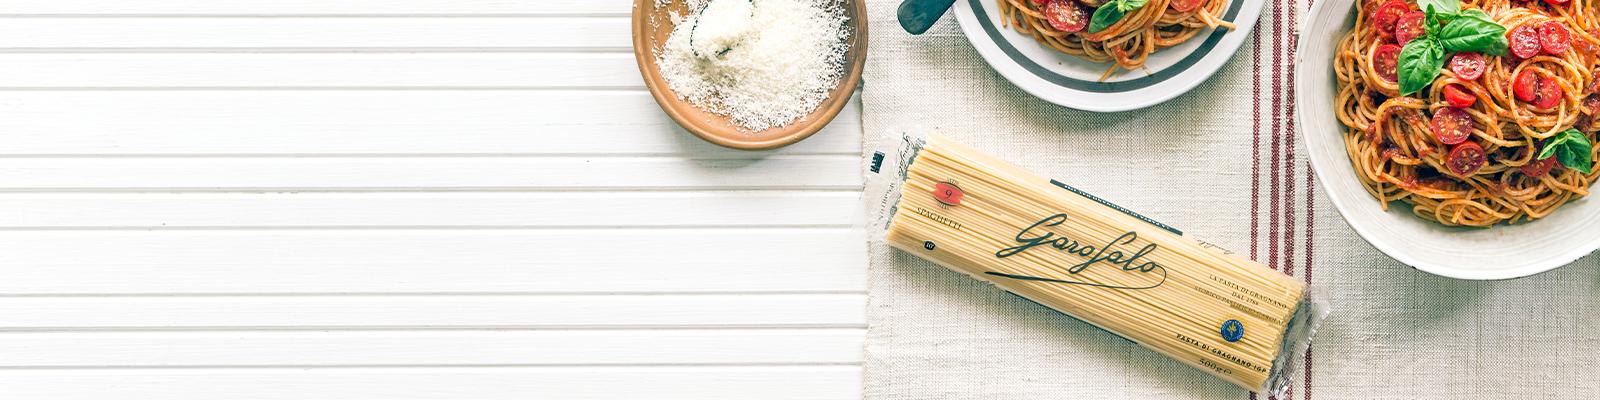 Pasta Garofalo - Long Pasta